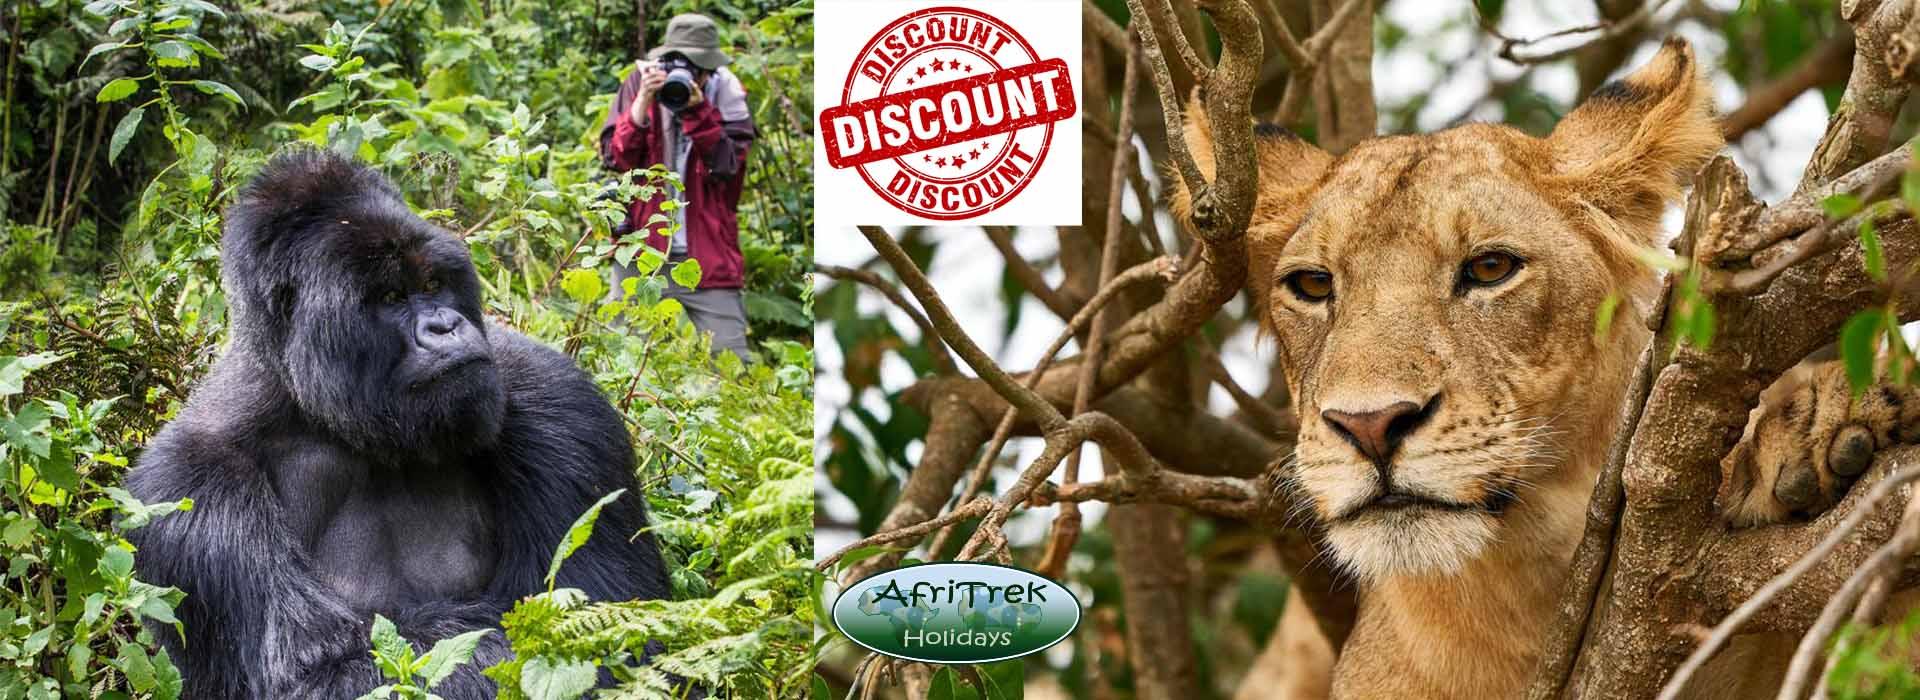 Uganda Announces 43% Discount on Gorilla Permits